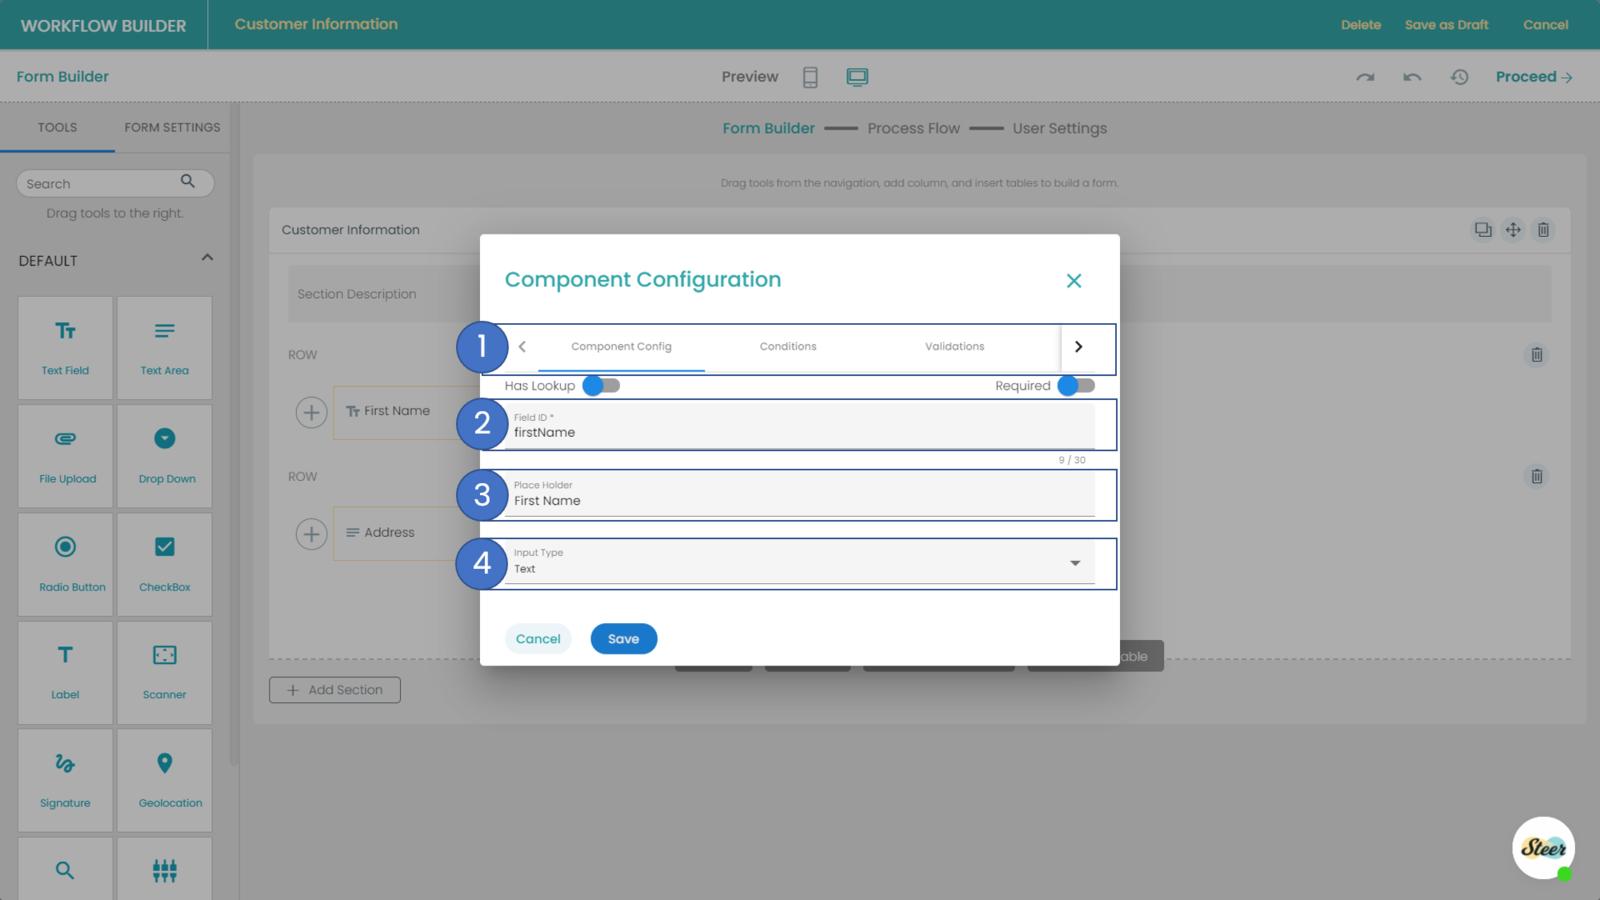 Component Configuration settings